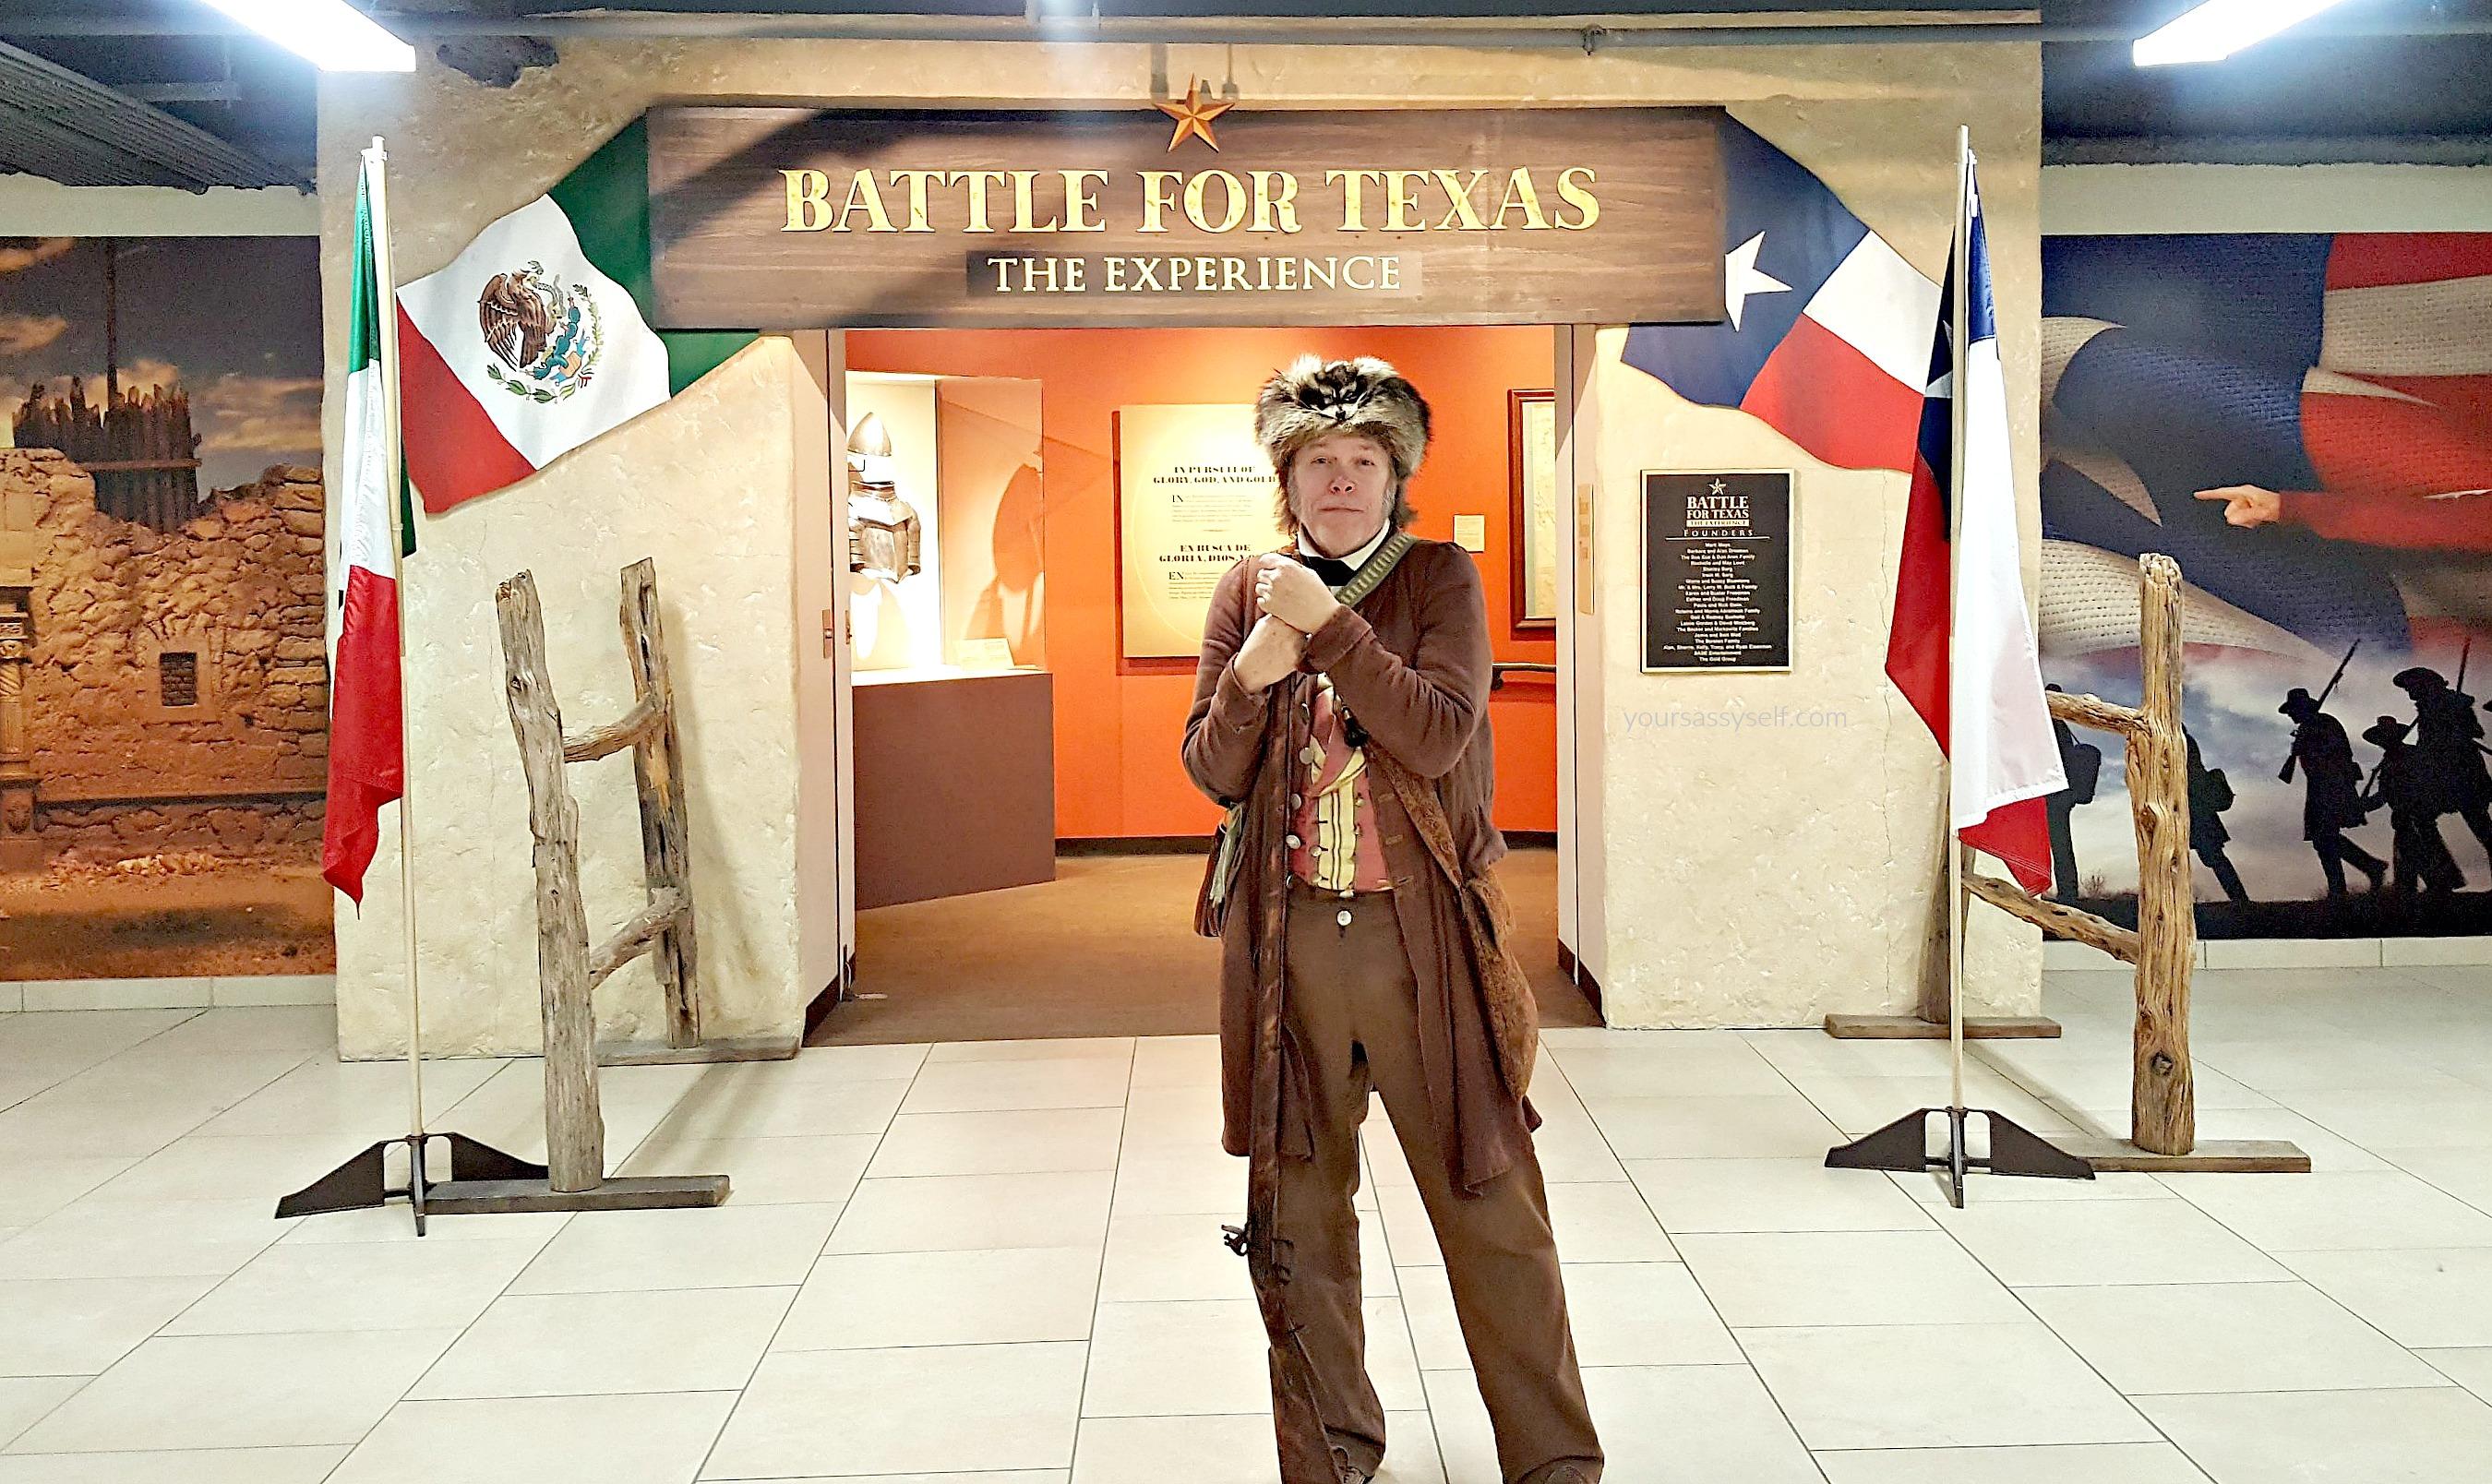 Davy Crockett at Battle for Texas - yoursassyself.com